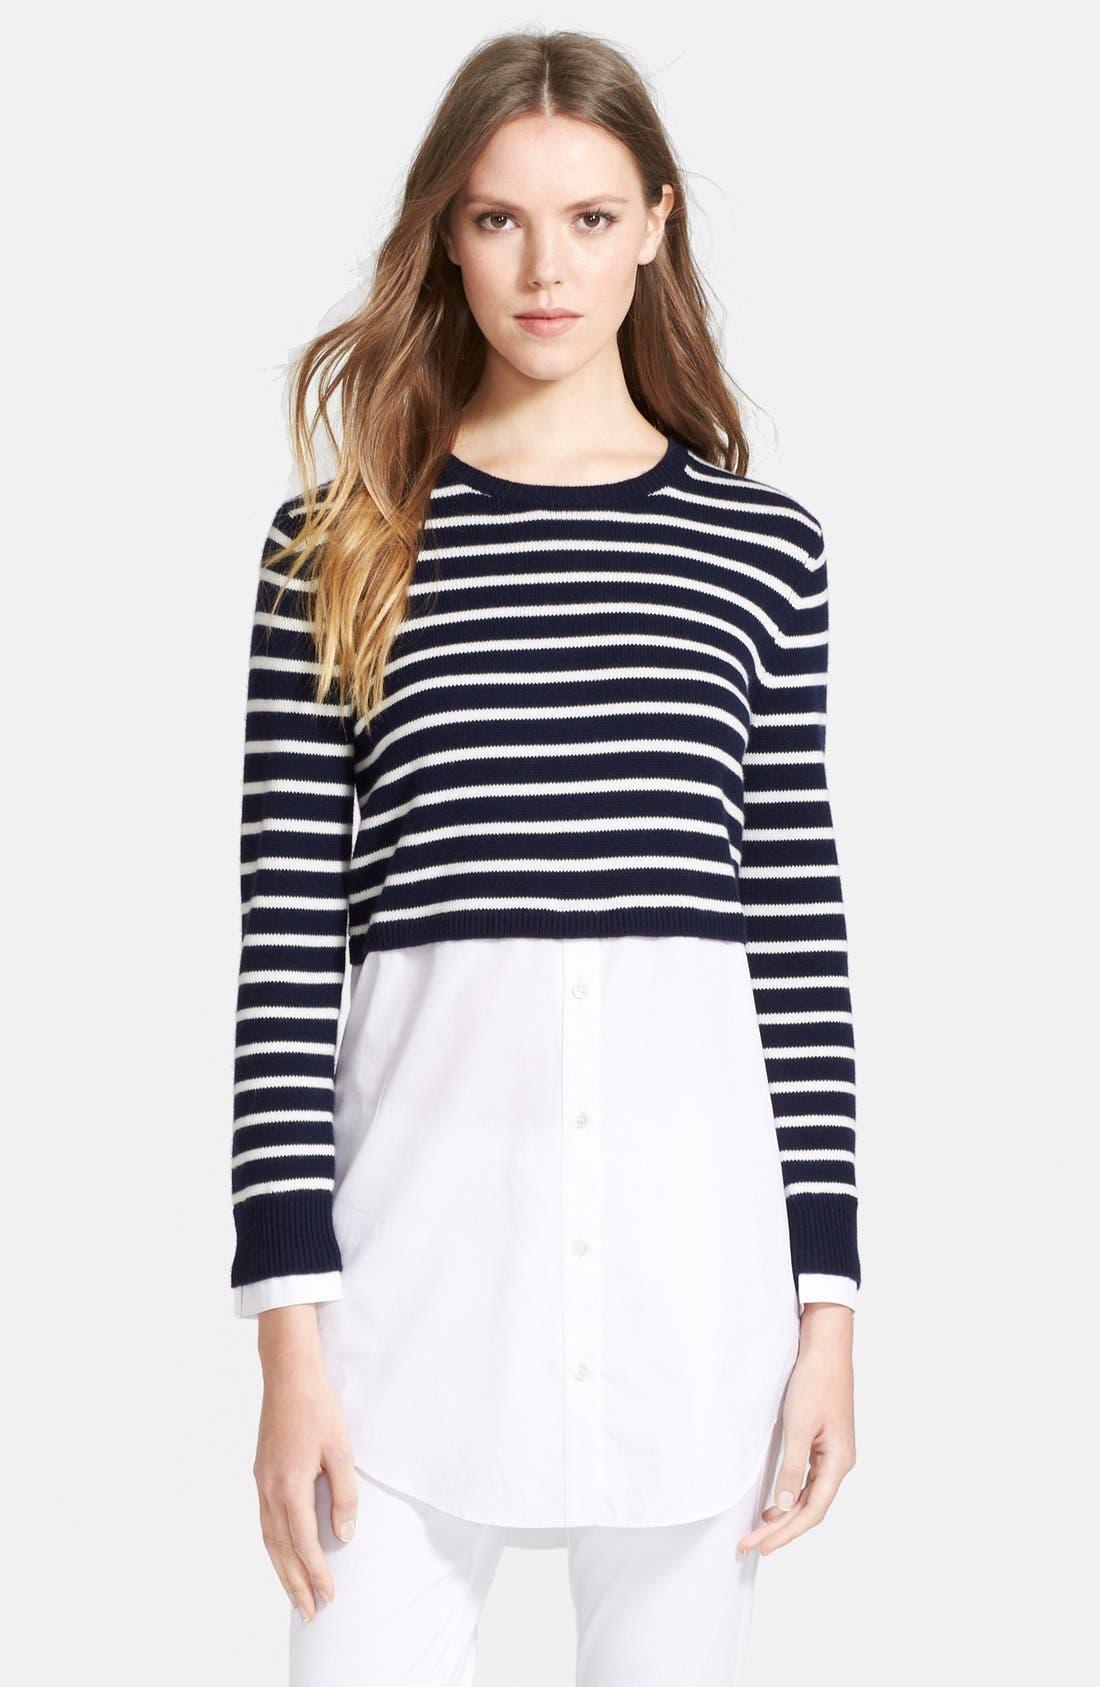 Main Image - Theory 'Rymalia' Stripe Crop Cotton & Cashmere Sweater with Poplin Underlay